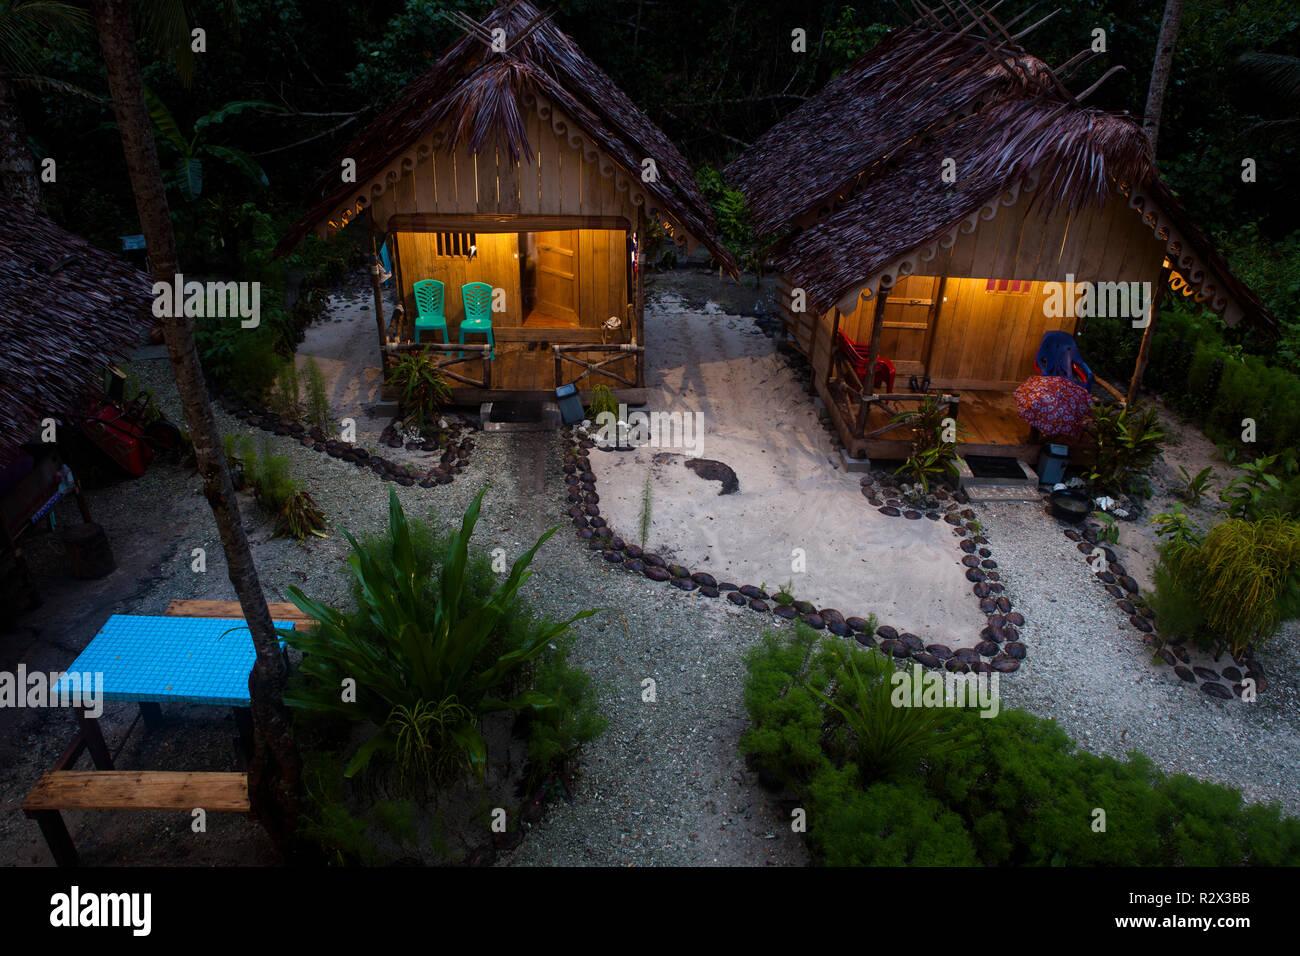 Beach bungalows at Bintang Surf Camp off Siberut Island. - Stock Image